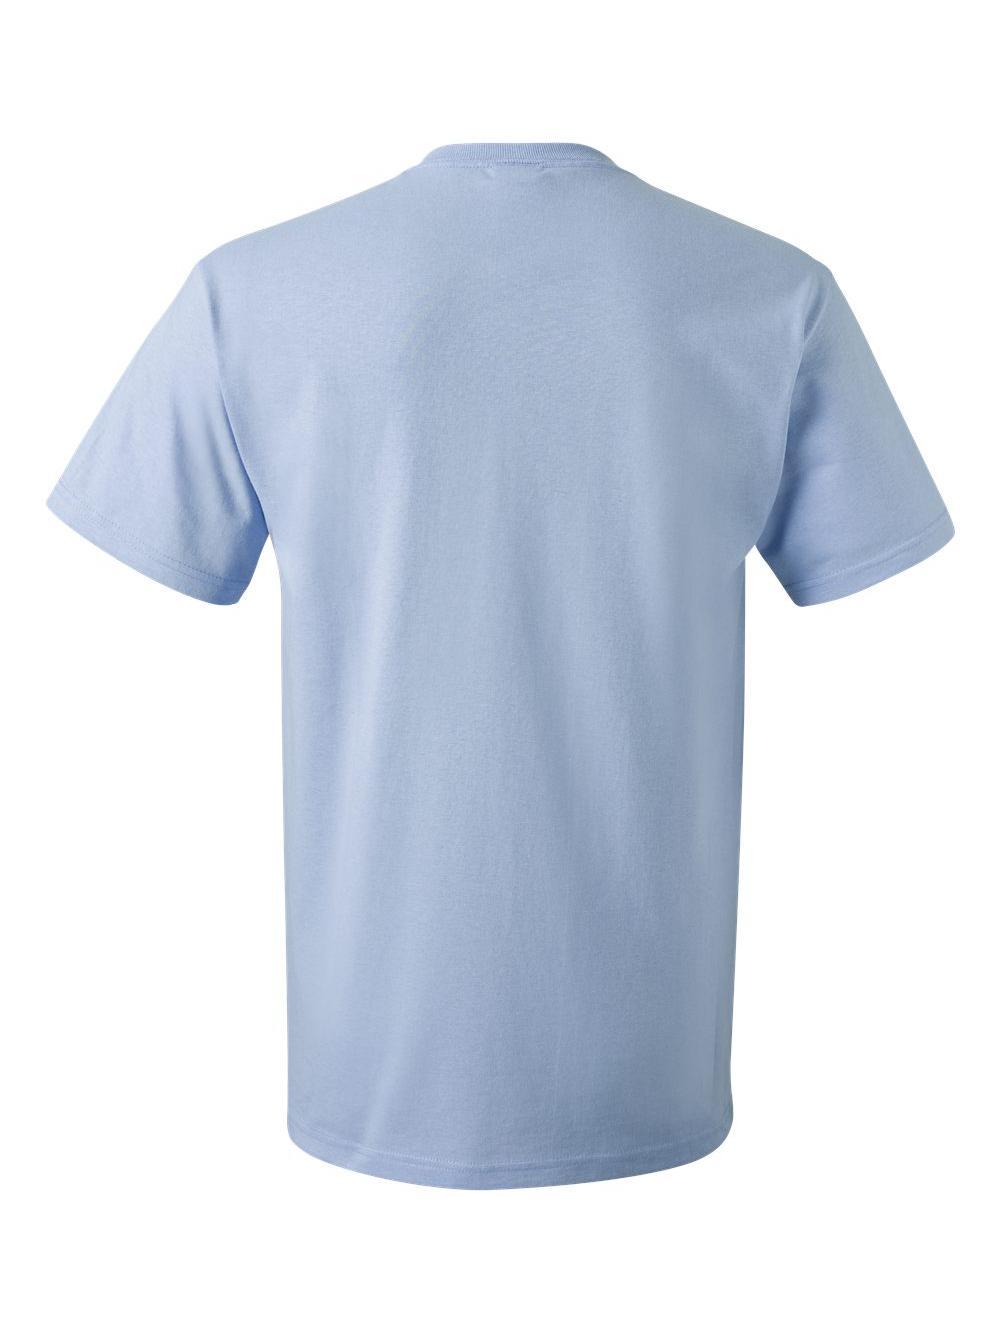 Fruit-of-the-Loom-HD-Cotton-Short-Sleeve-T-Shirt-3930R thumbnail 73